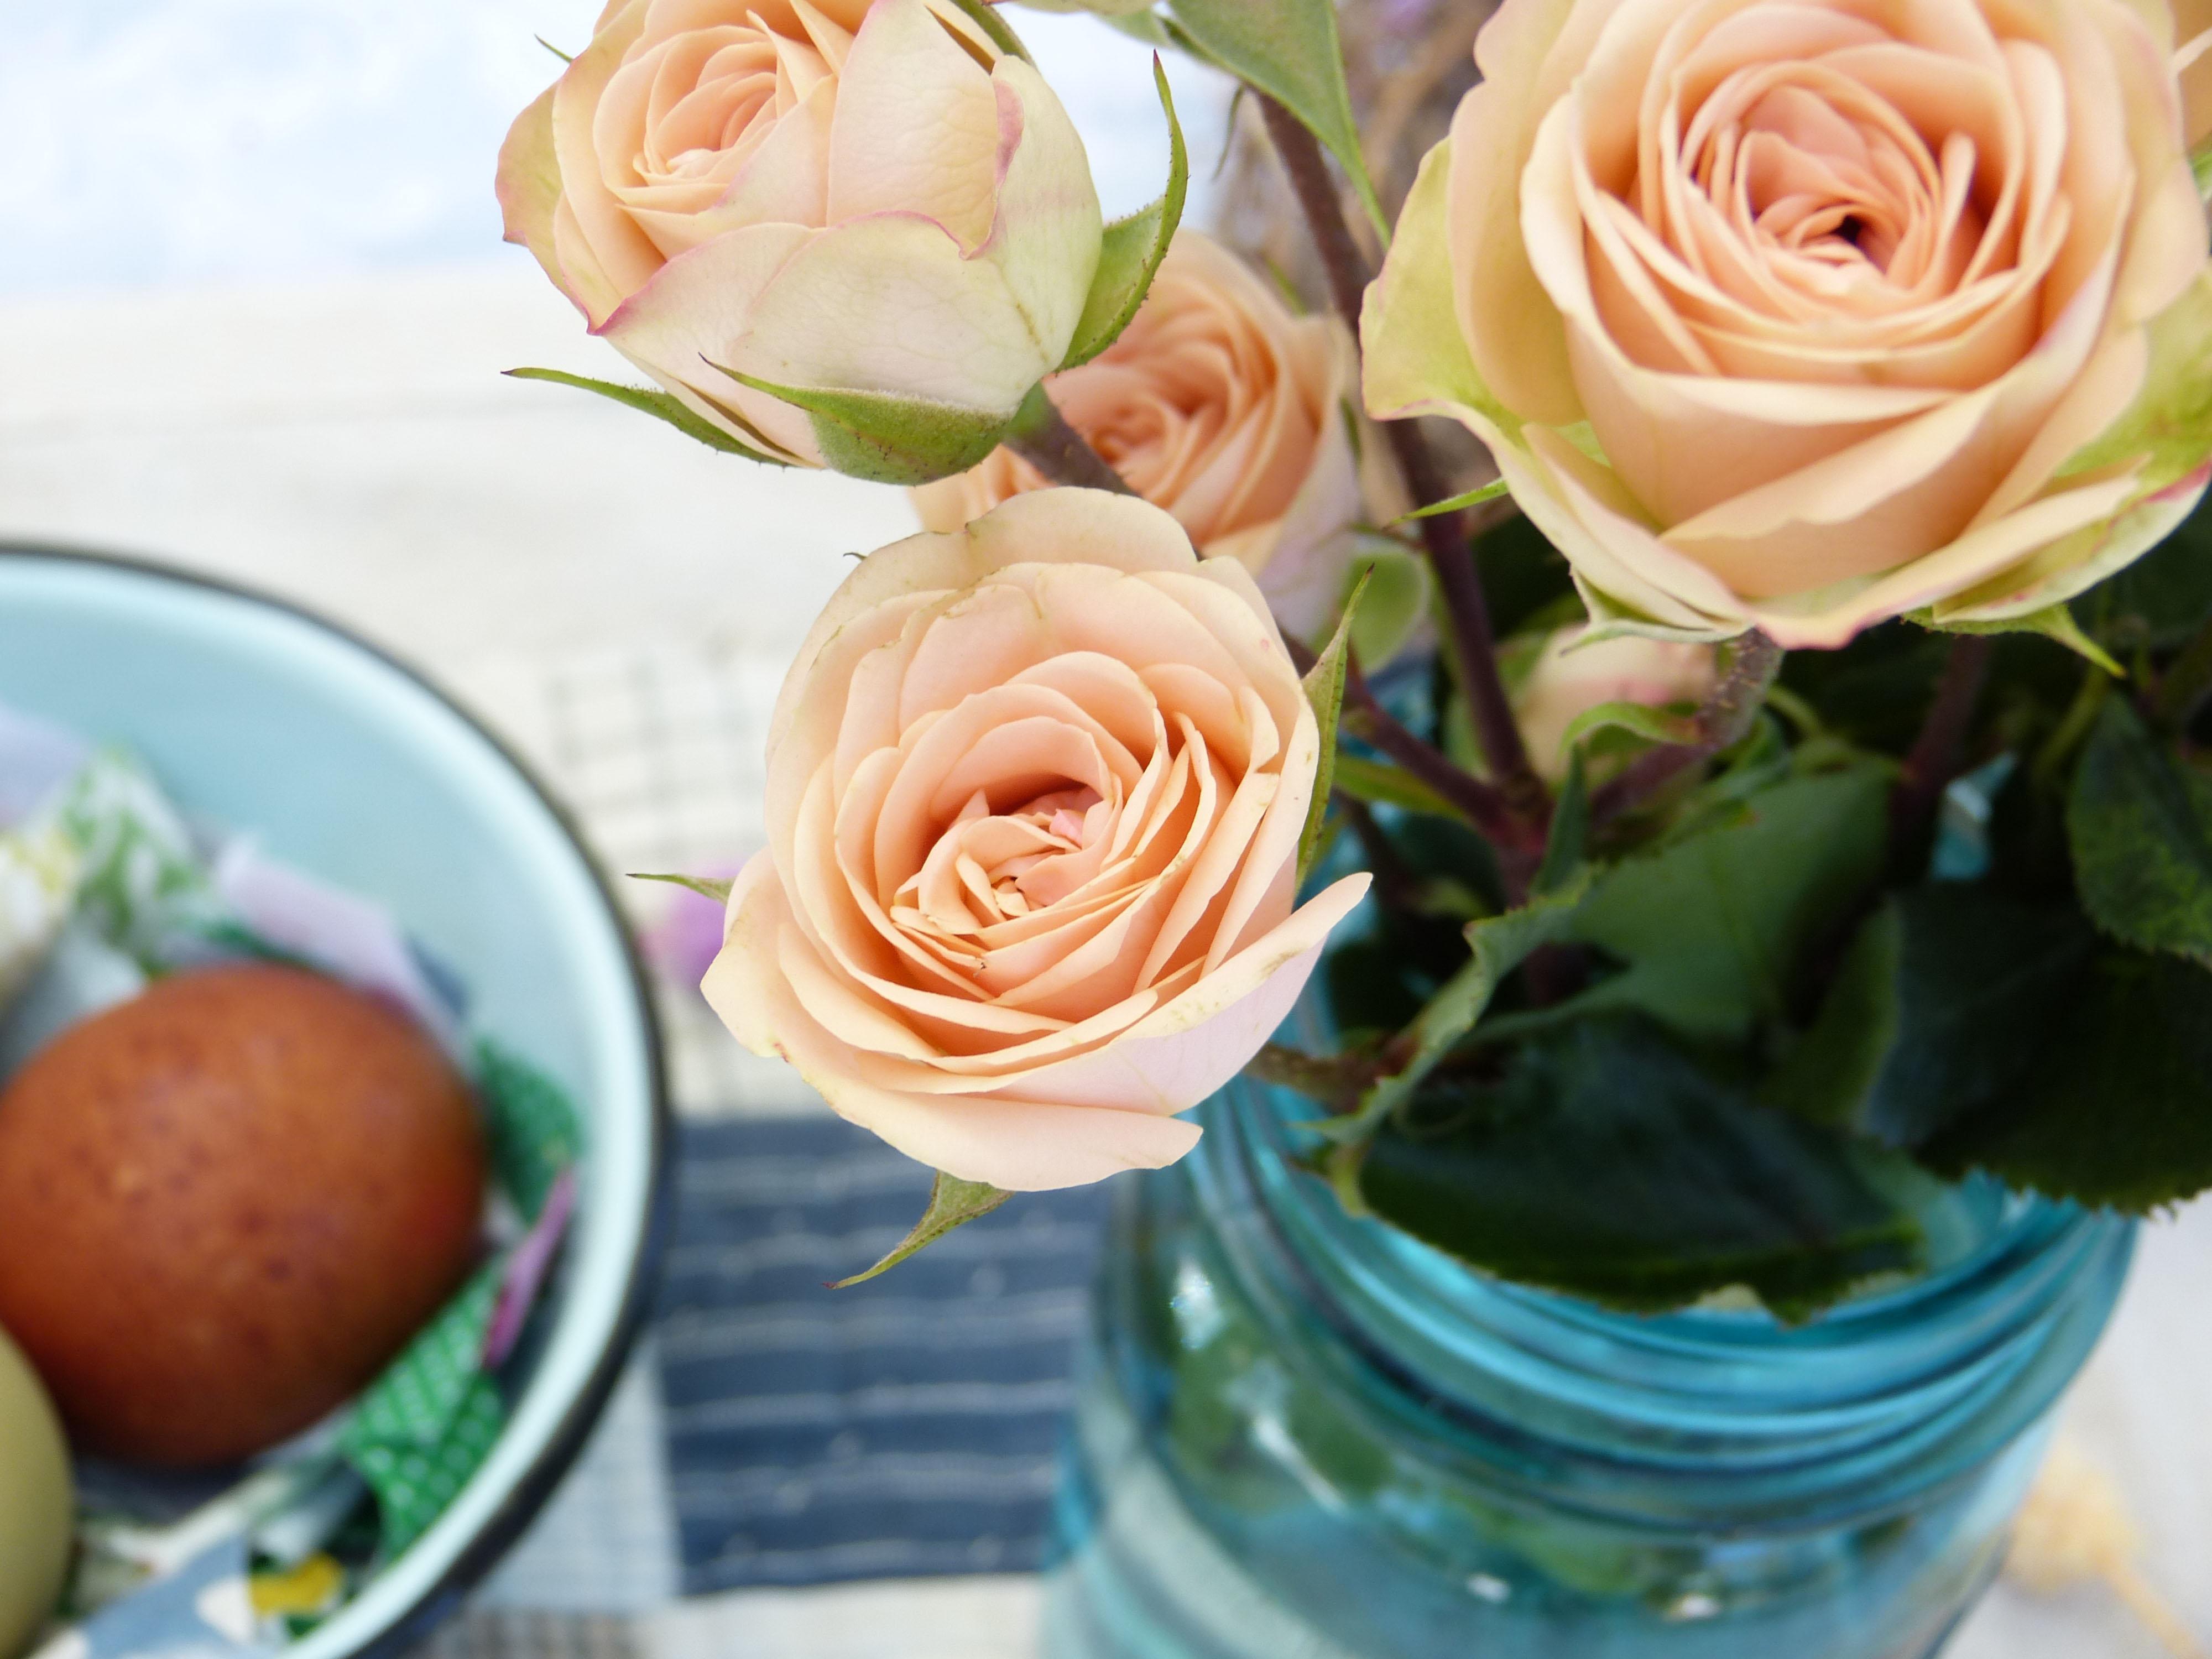 roses_18628bc